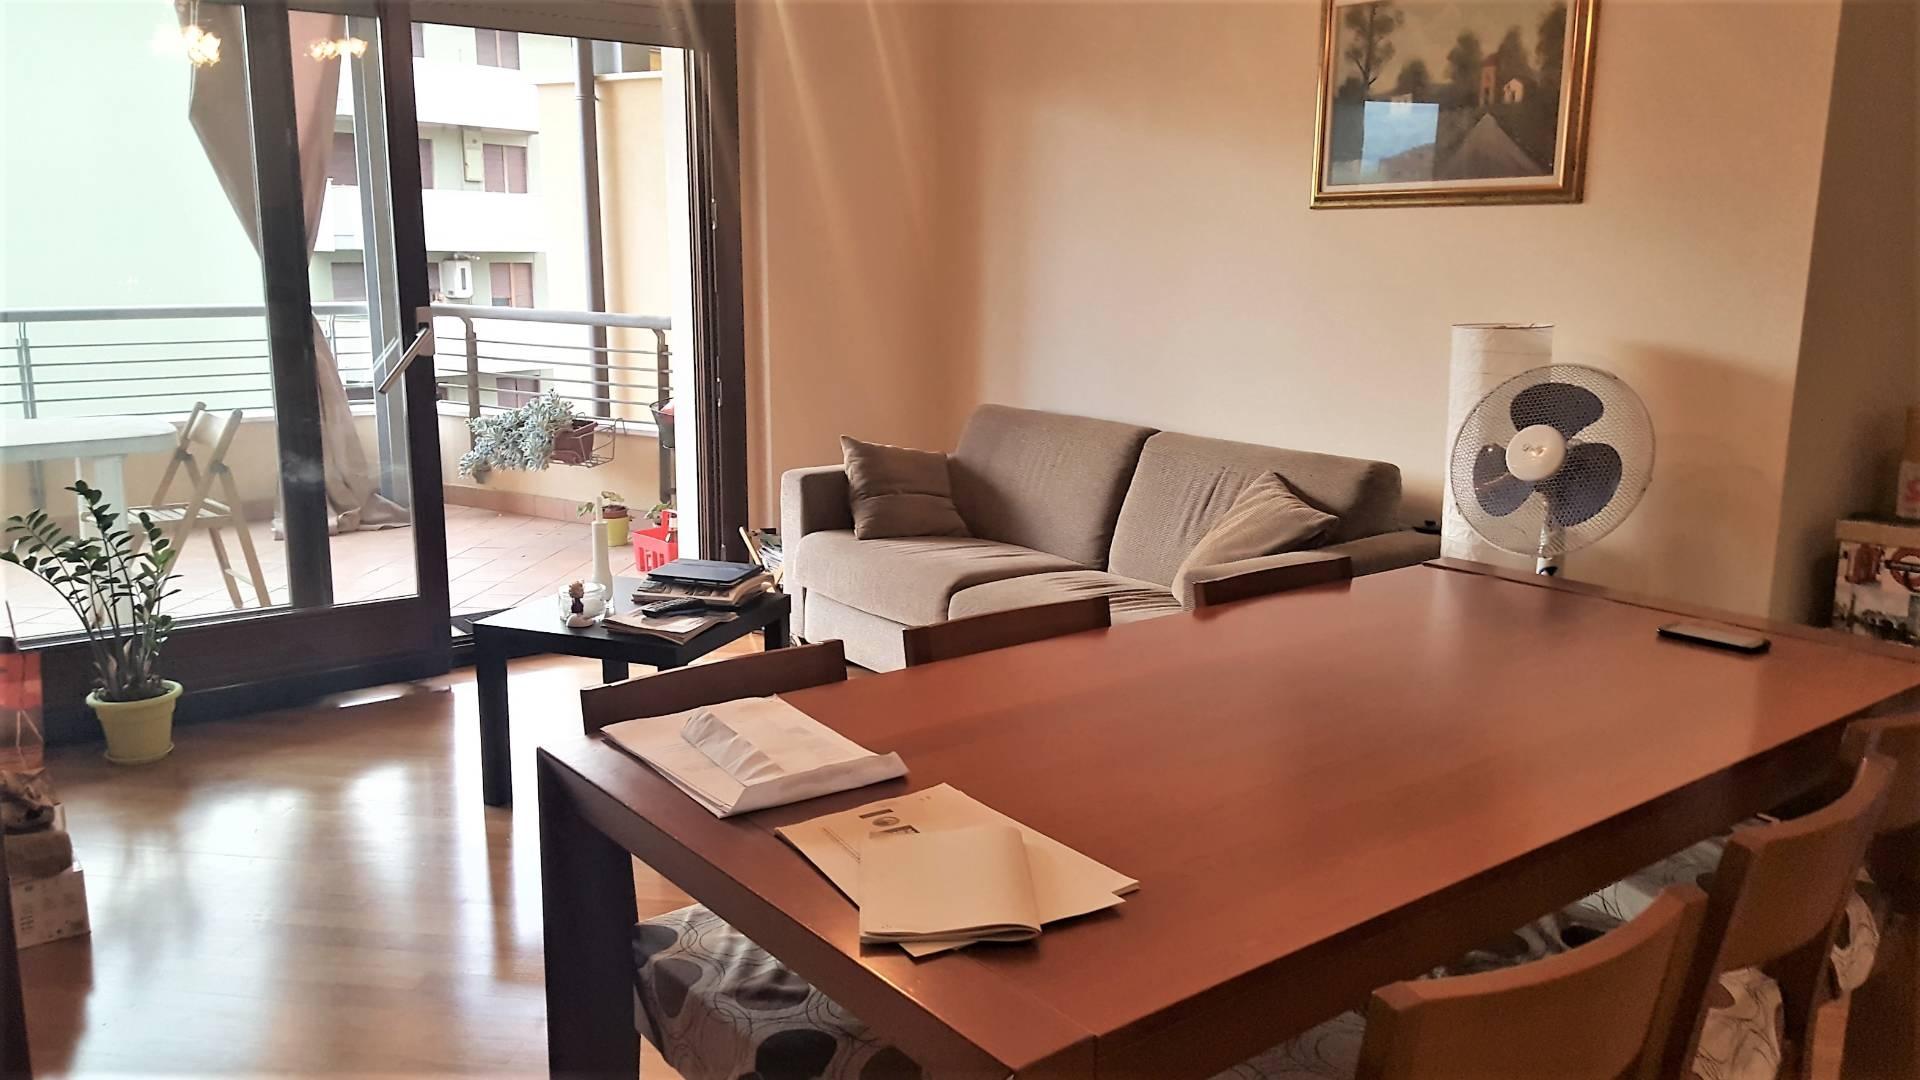 Camere Pescara Centro : Appartamento in affitto a pescara cod a